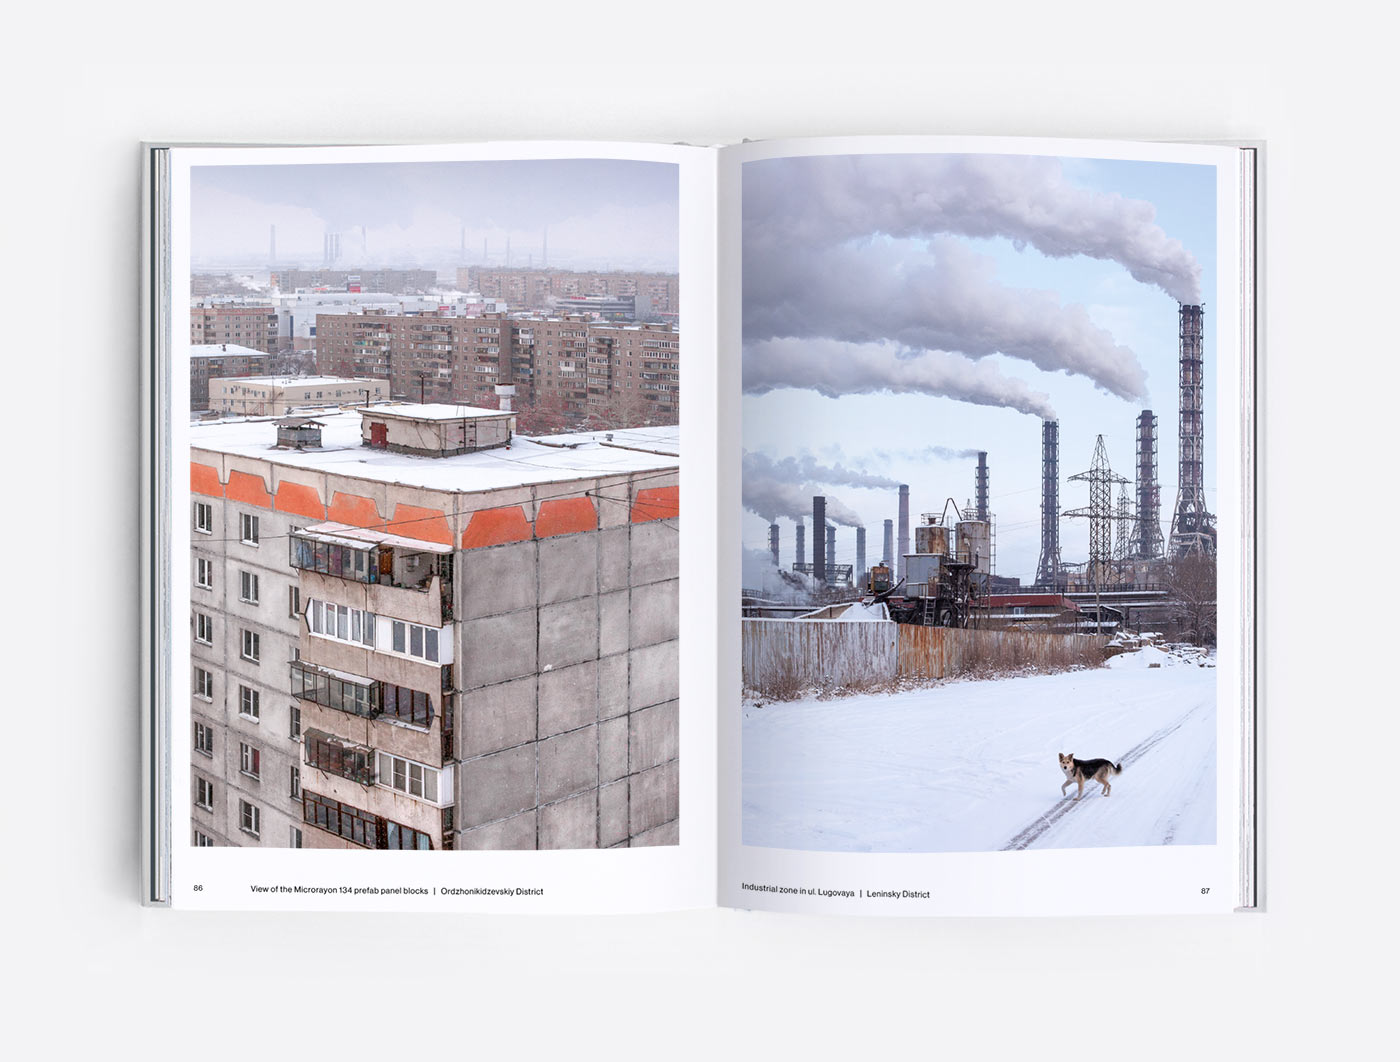 Industrial landscapes of Magnitogorsk